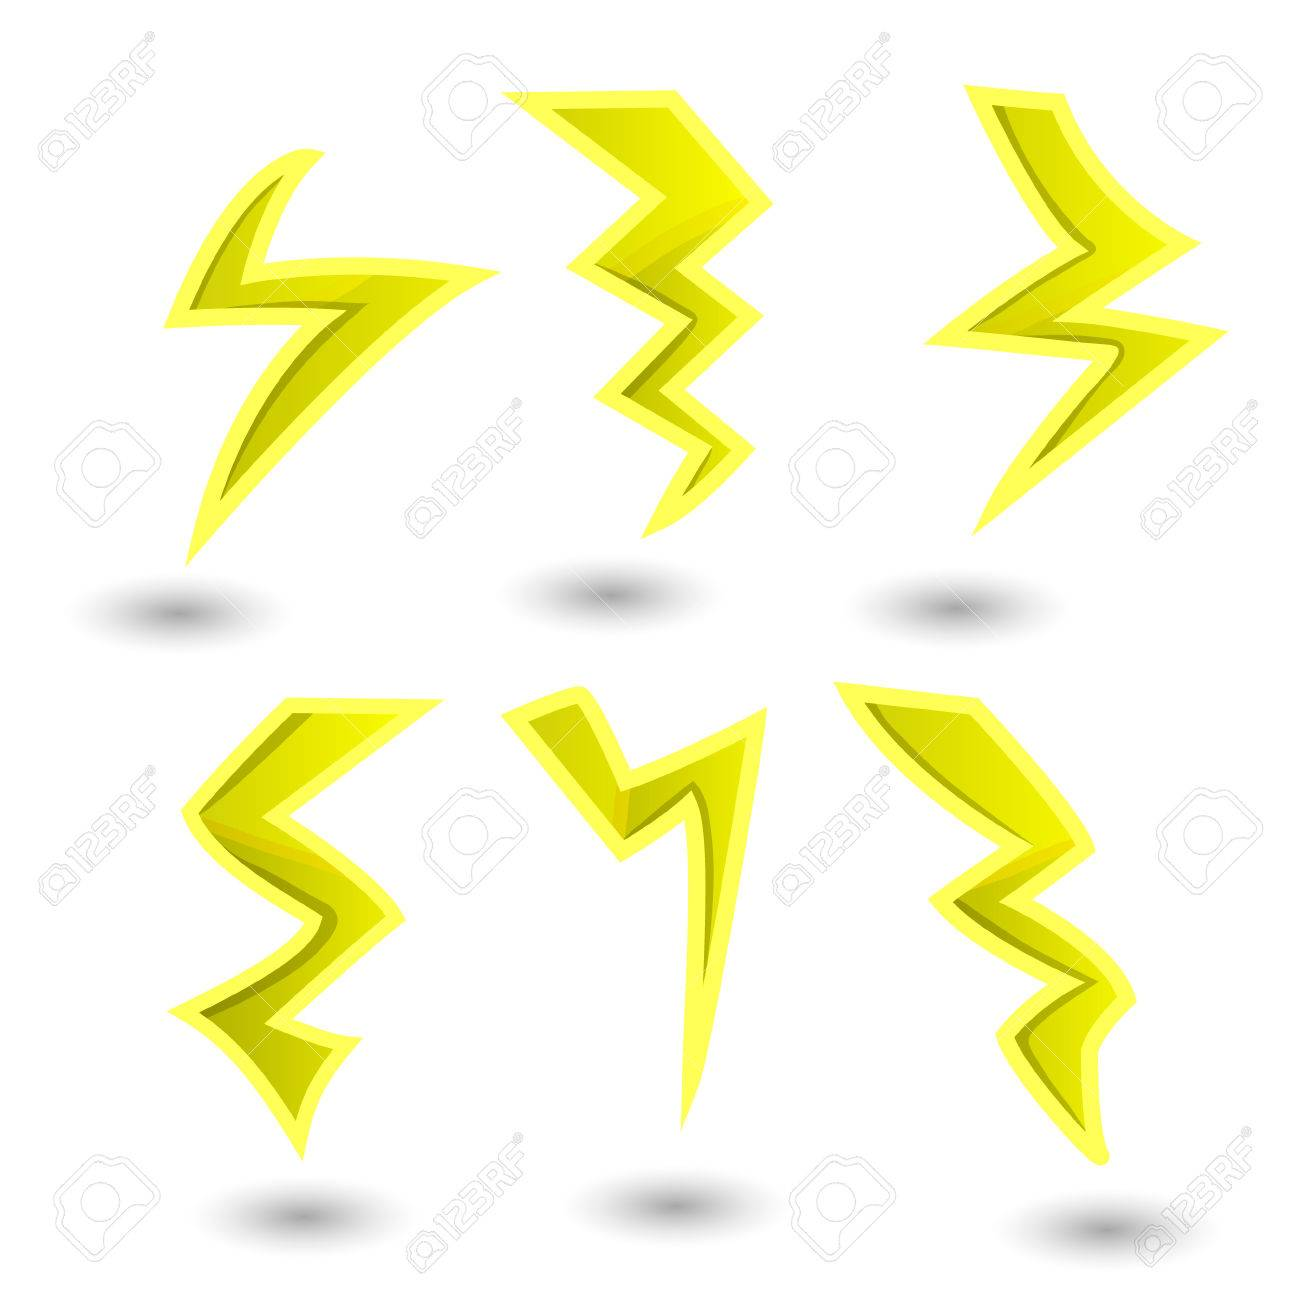 Picture Of Lightning Bolt Free download best